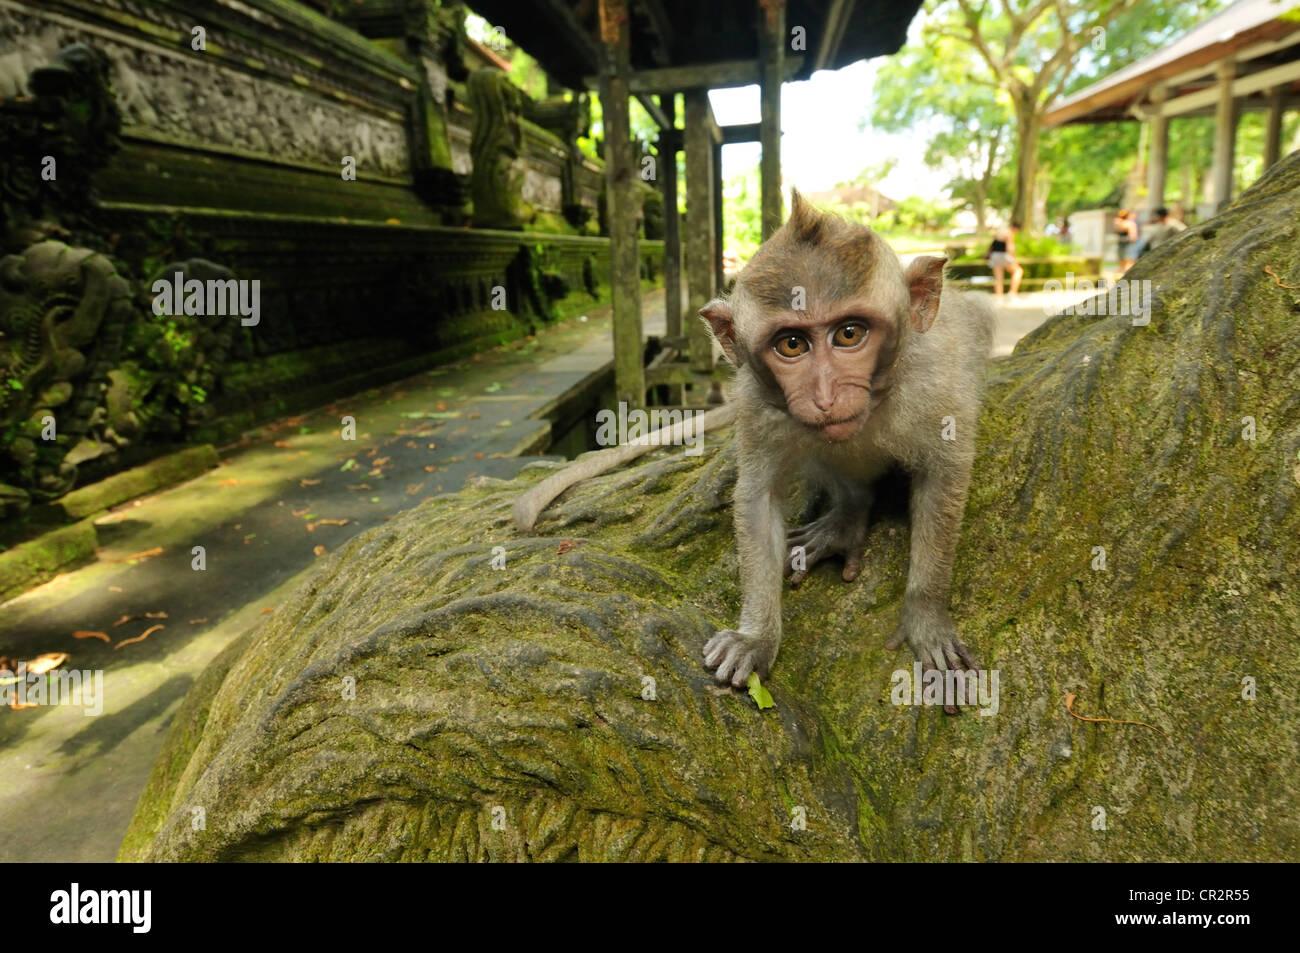 Lunga coda Macaque Macaca fascicularis, Cercopithecidae, Ubud Monkey Forest, Ubud, Bali, Indonesia, Asia Immagini Stock